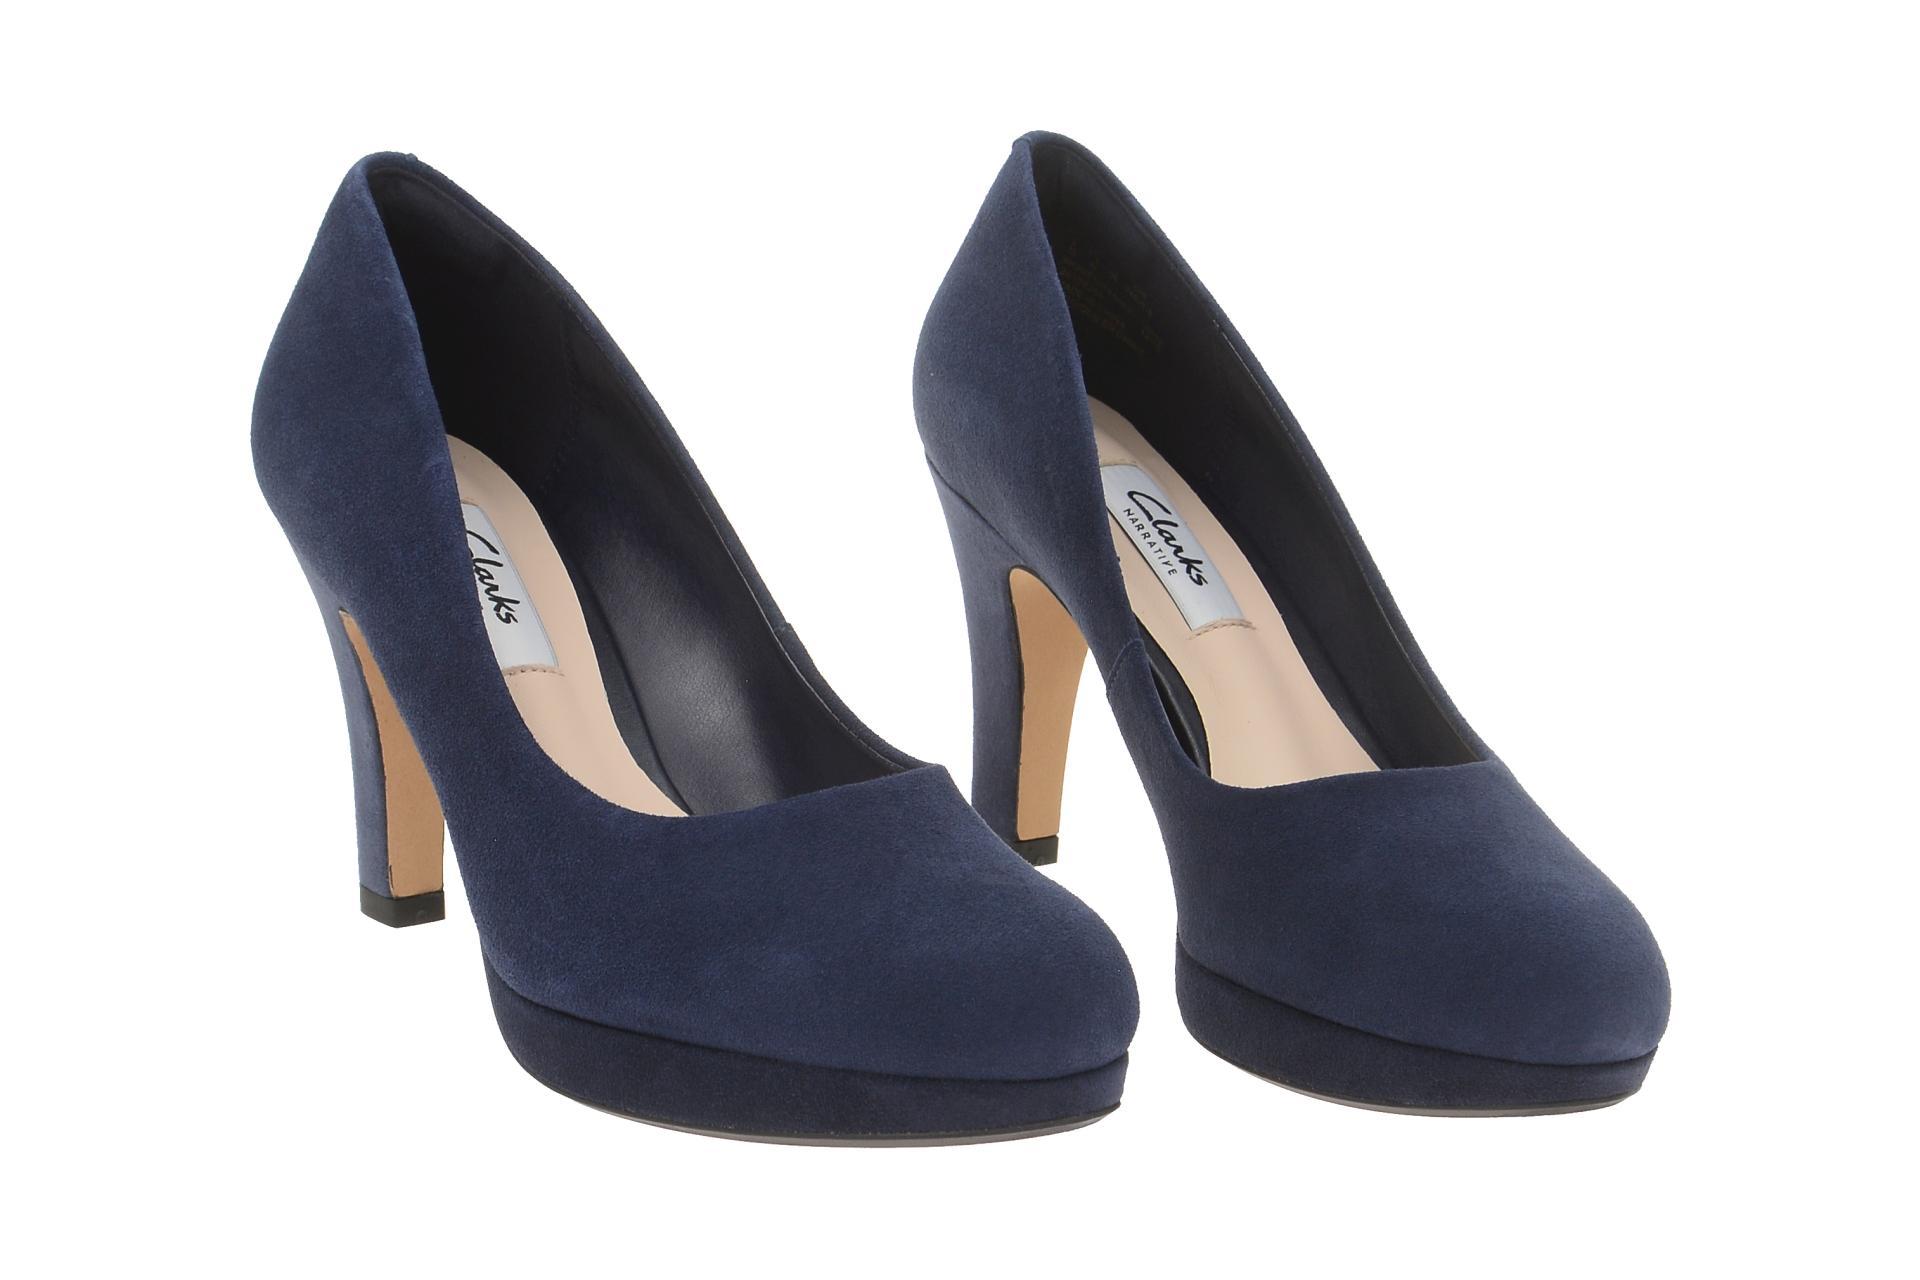 clarks crisp kendra pumps blau high heels schuhhaus strauch shop. Black Bedroom Furniture Sets. Home Design Ideas